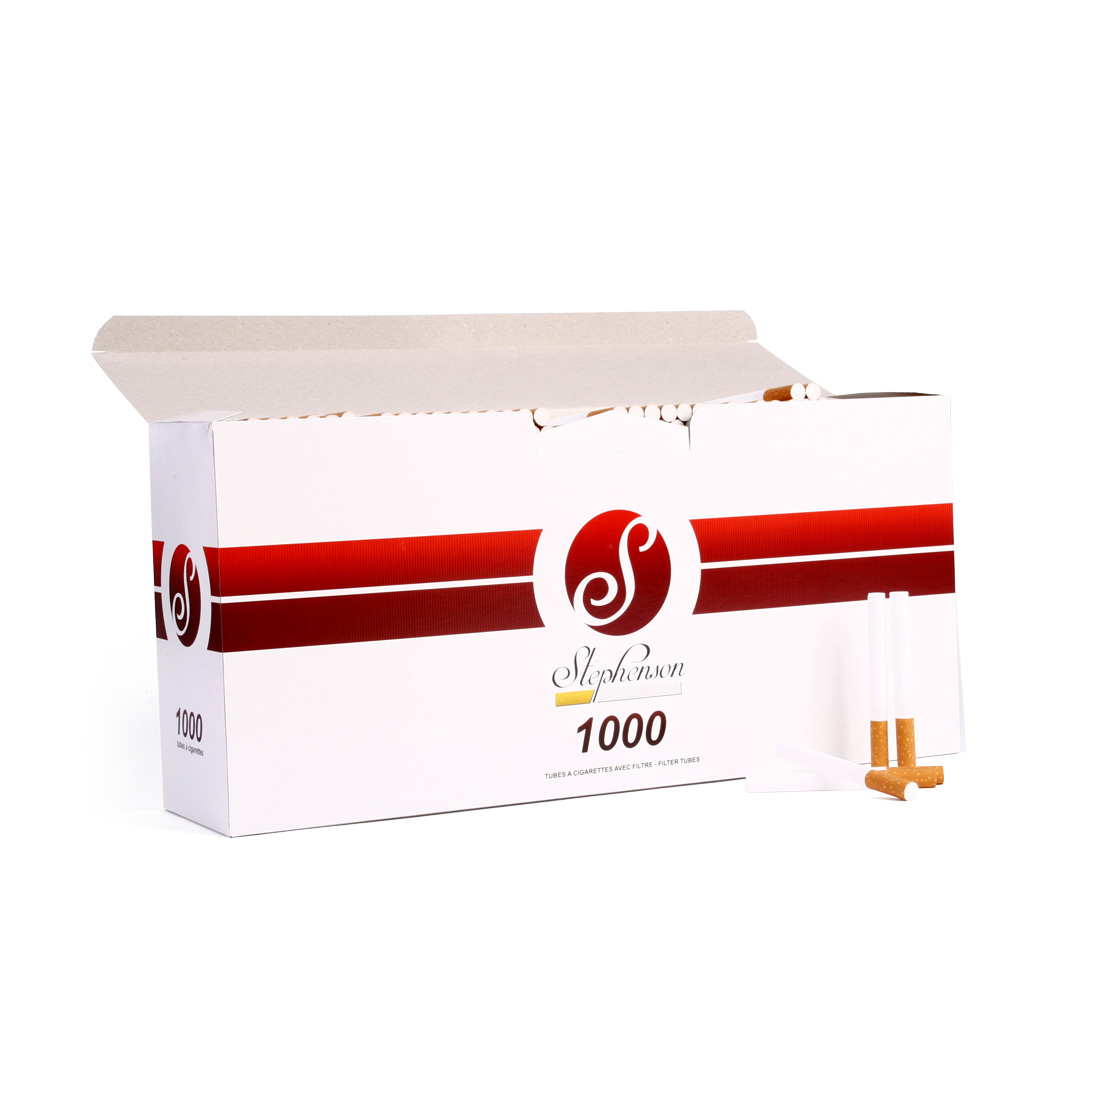 tubes à cigarettes stephenson